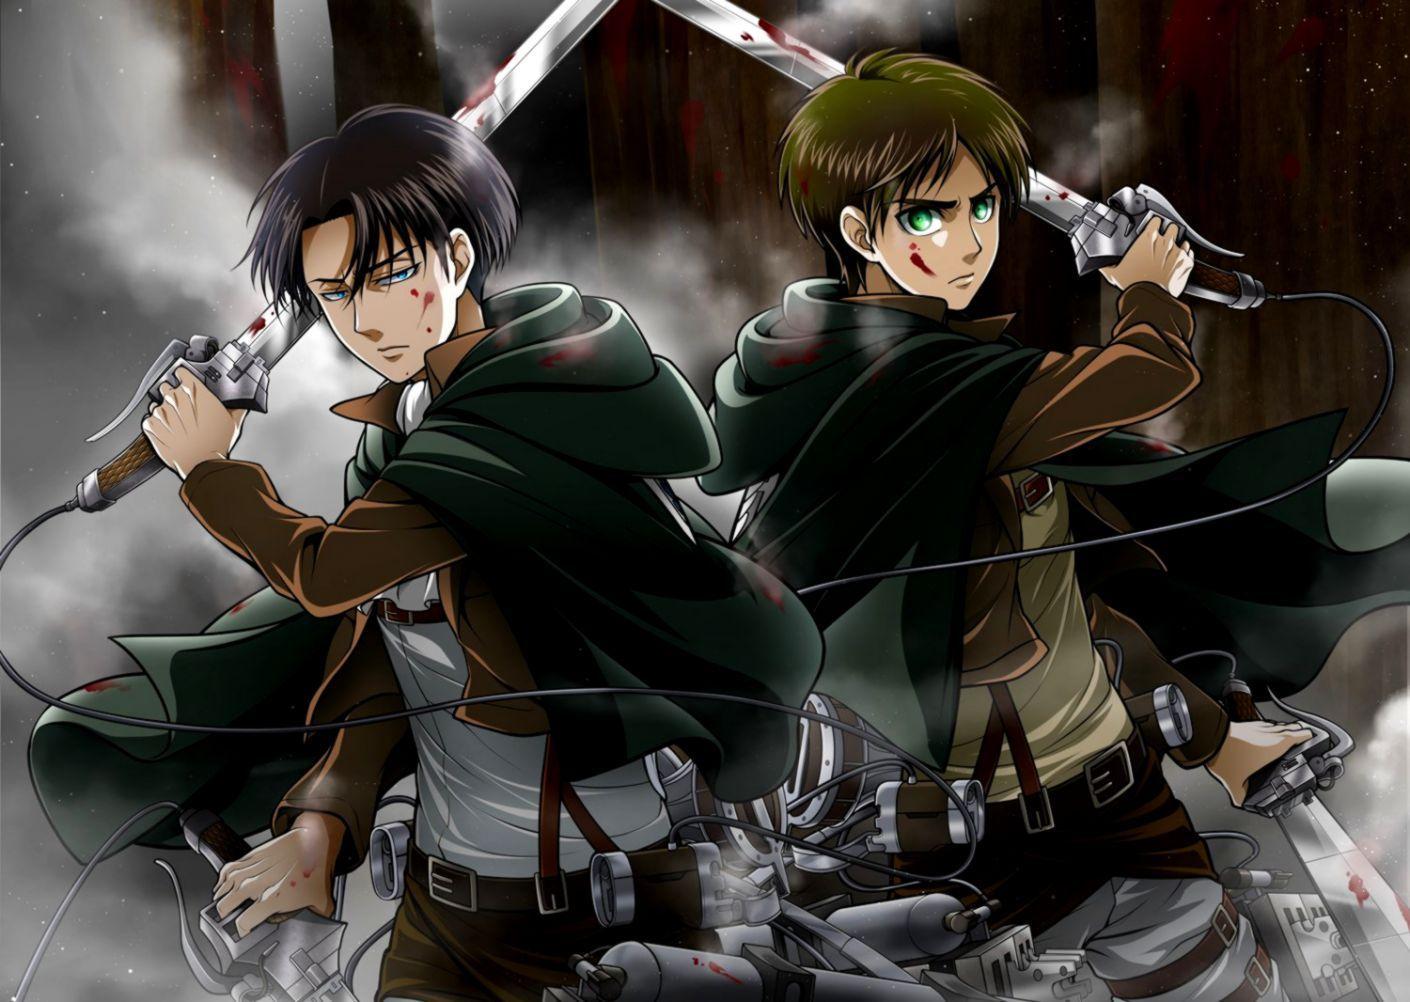 Mikasa levi colossal titan attack on titan shingeki no kyojin 4k wallpaper. Eren and Levi Wallpapers - Top Free Eren and Levi ...